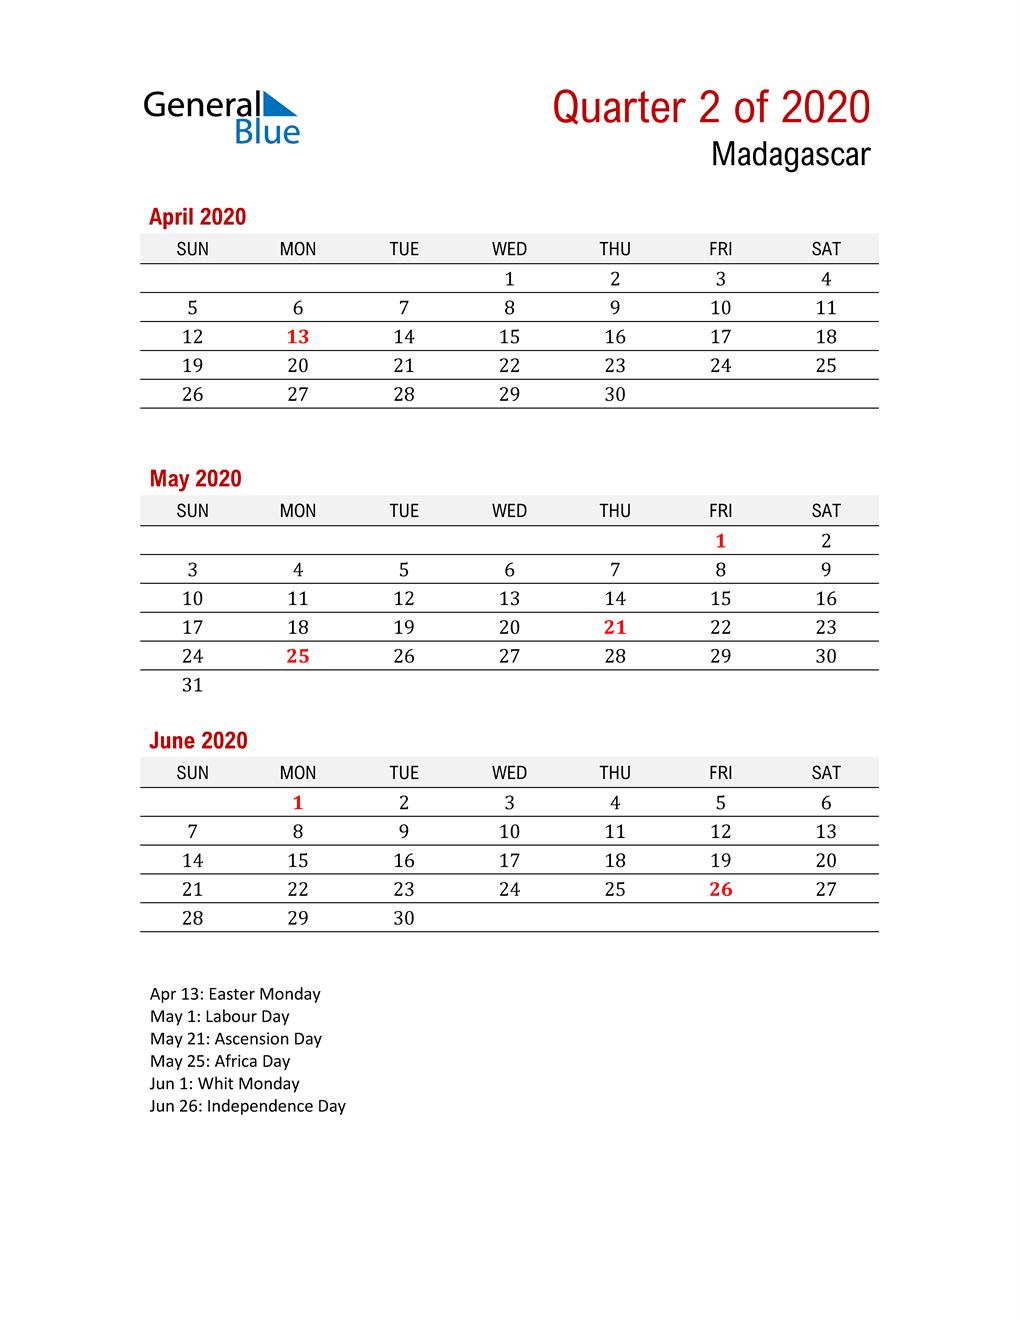 Printable Three Month Calendar for Madagascar